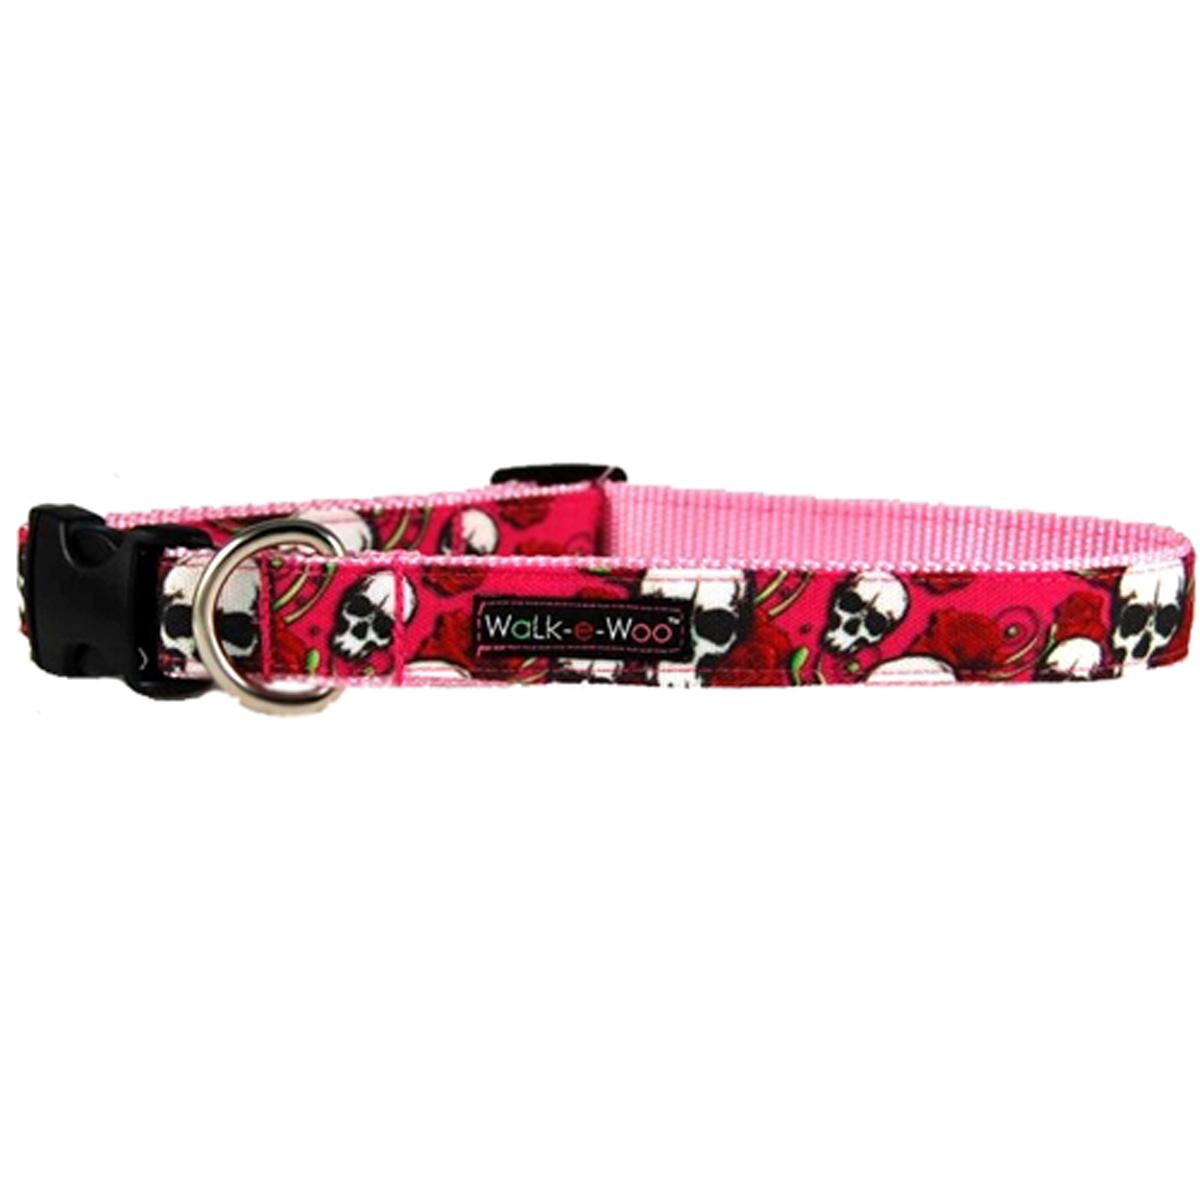 WaLk-e-Woo Skulls n' Roses Dog Collar - Pink